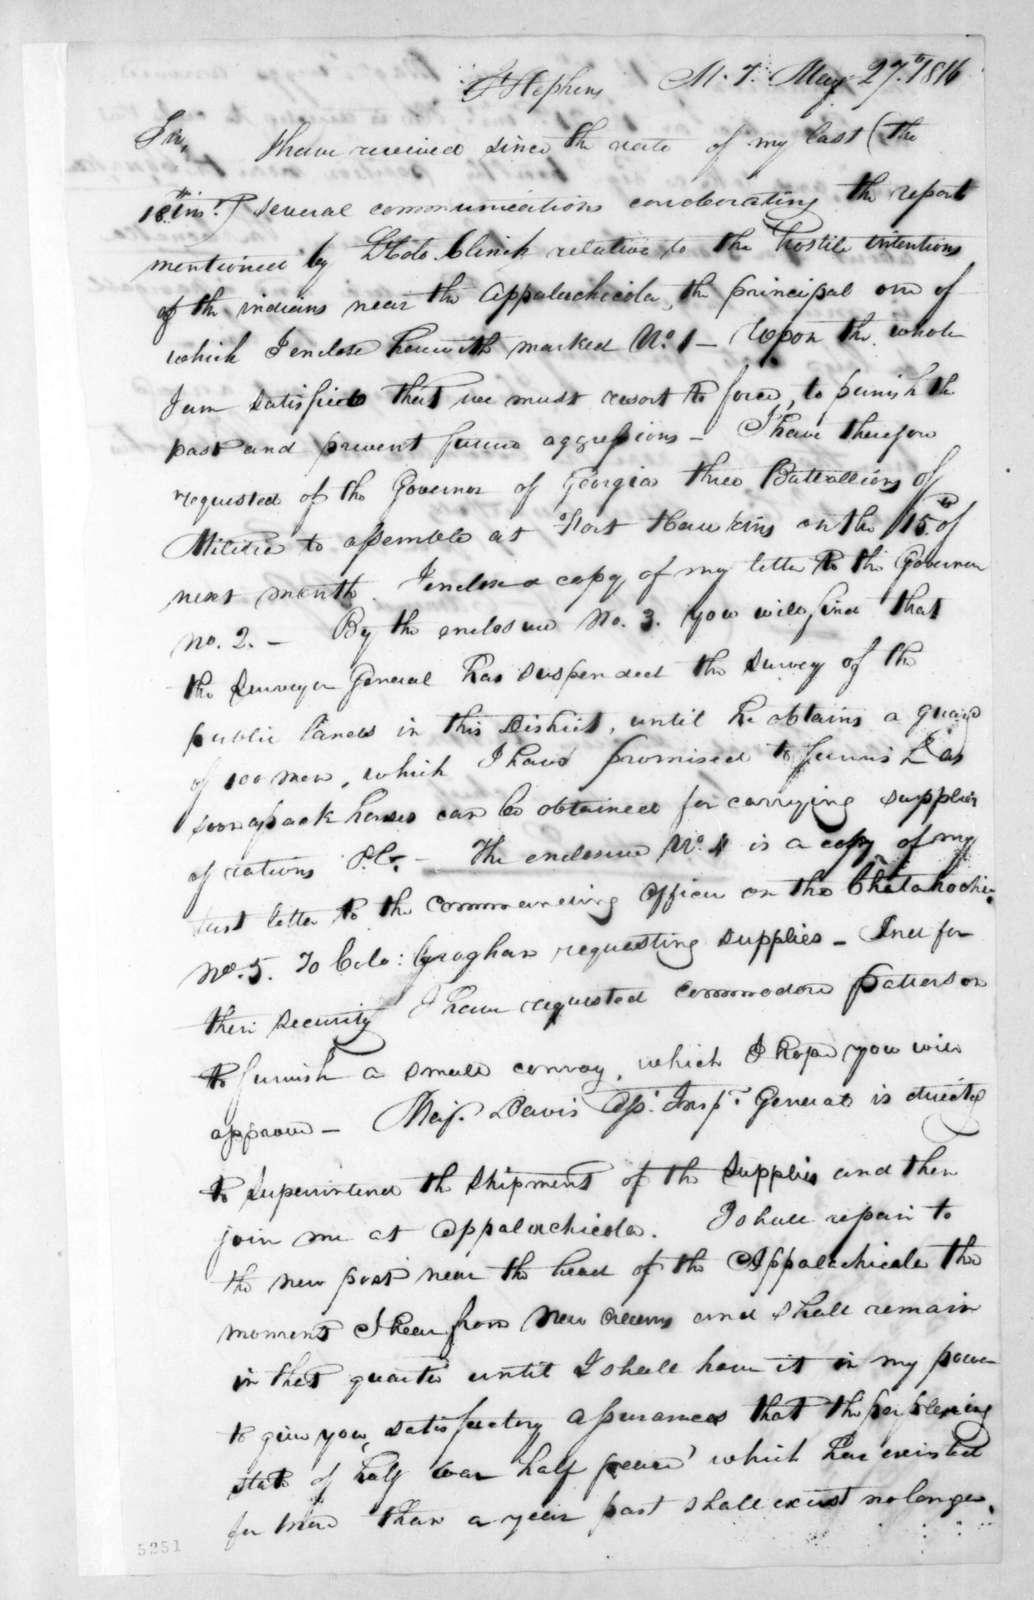 Edmund Pendleton Gaines to Andrew Jackson, May 27, 1816